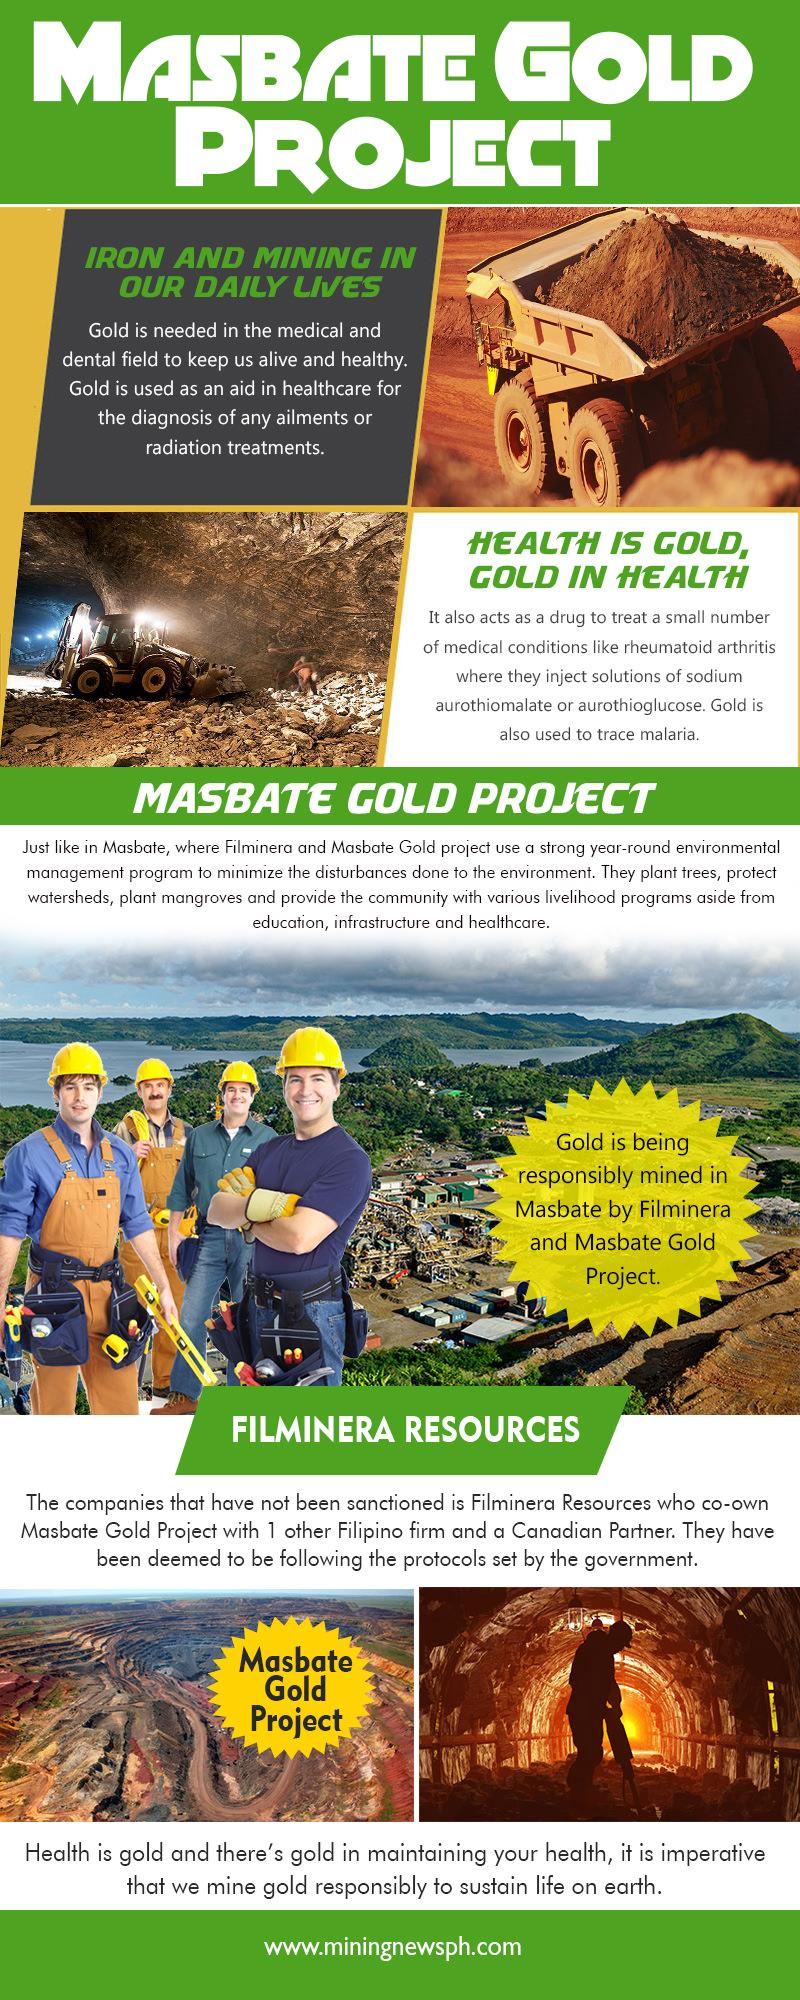 Masbate Gold Project